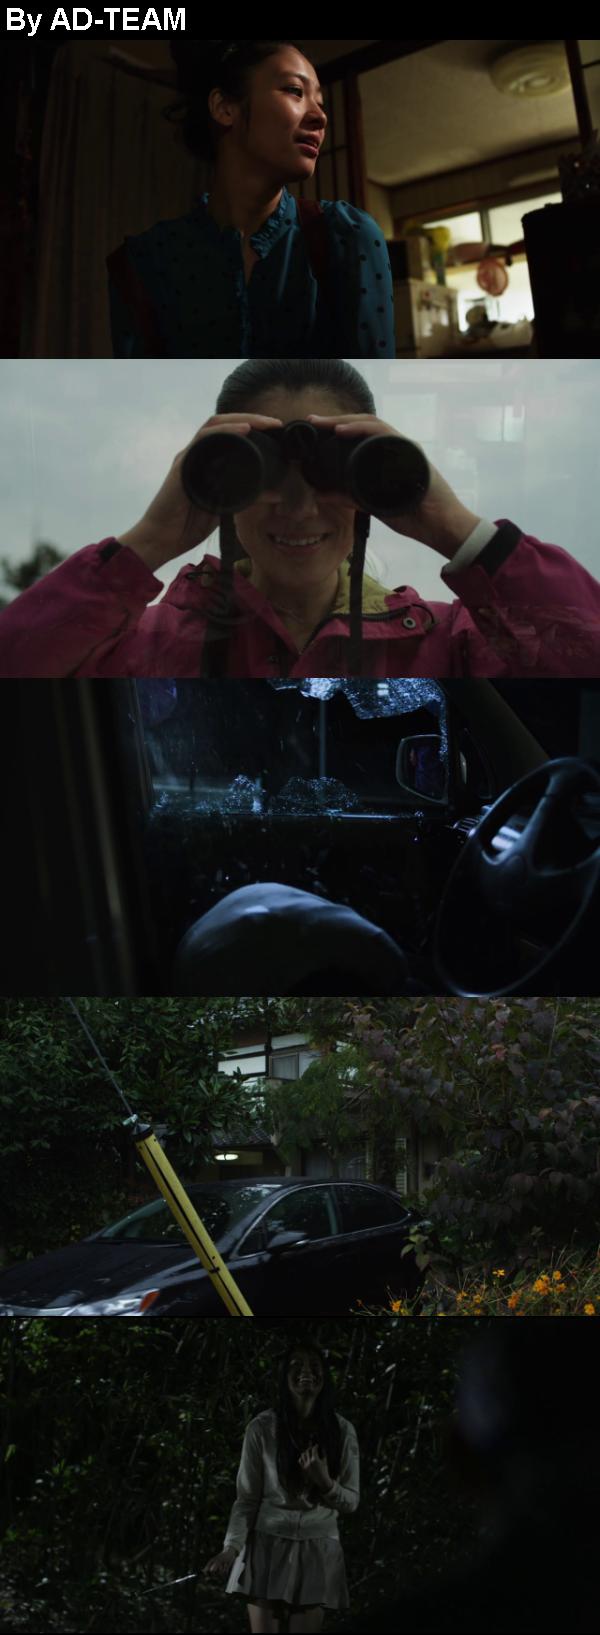 Greatful Dead (2013) BluRay 720p YIFY